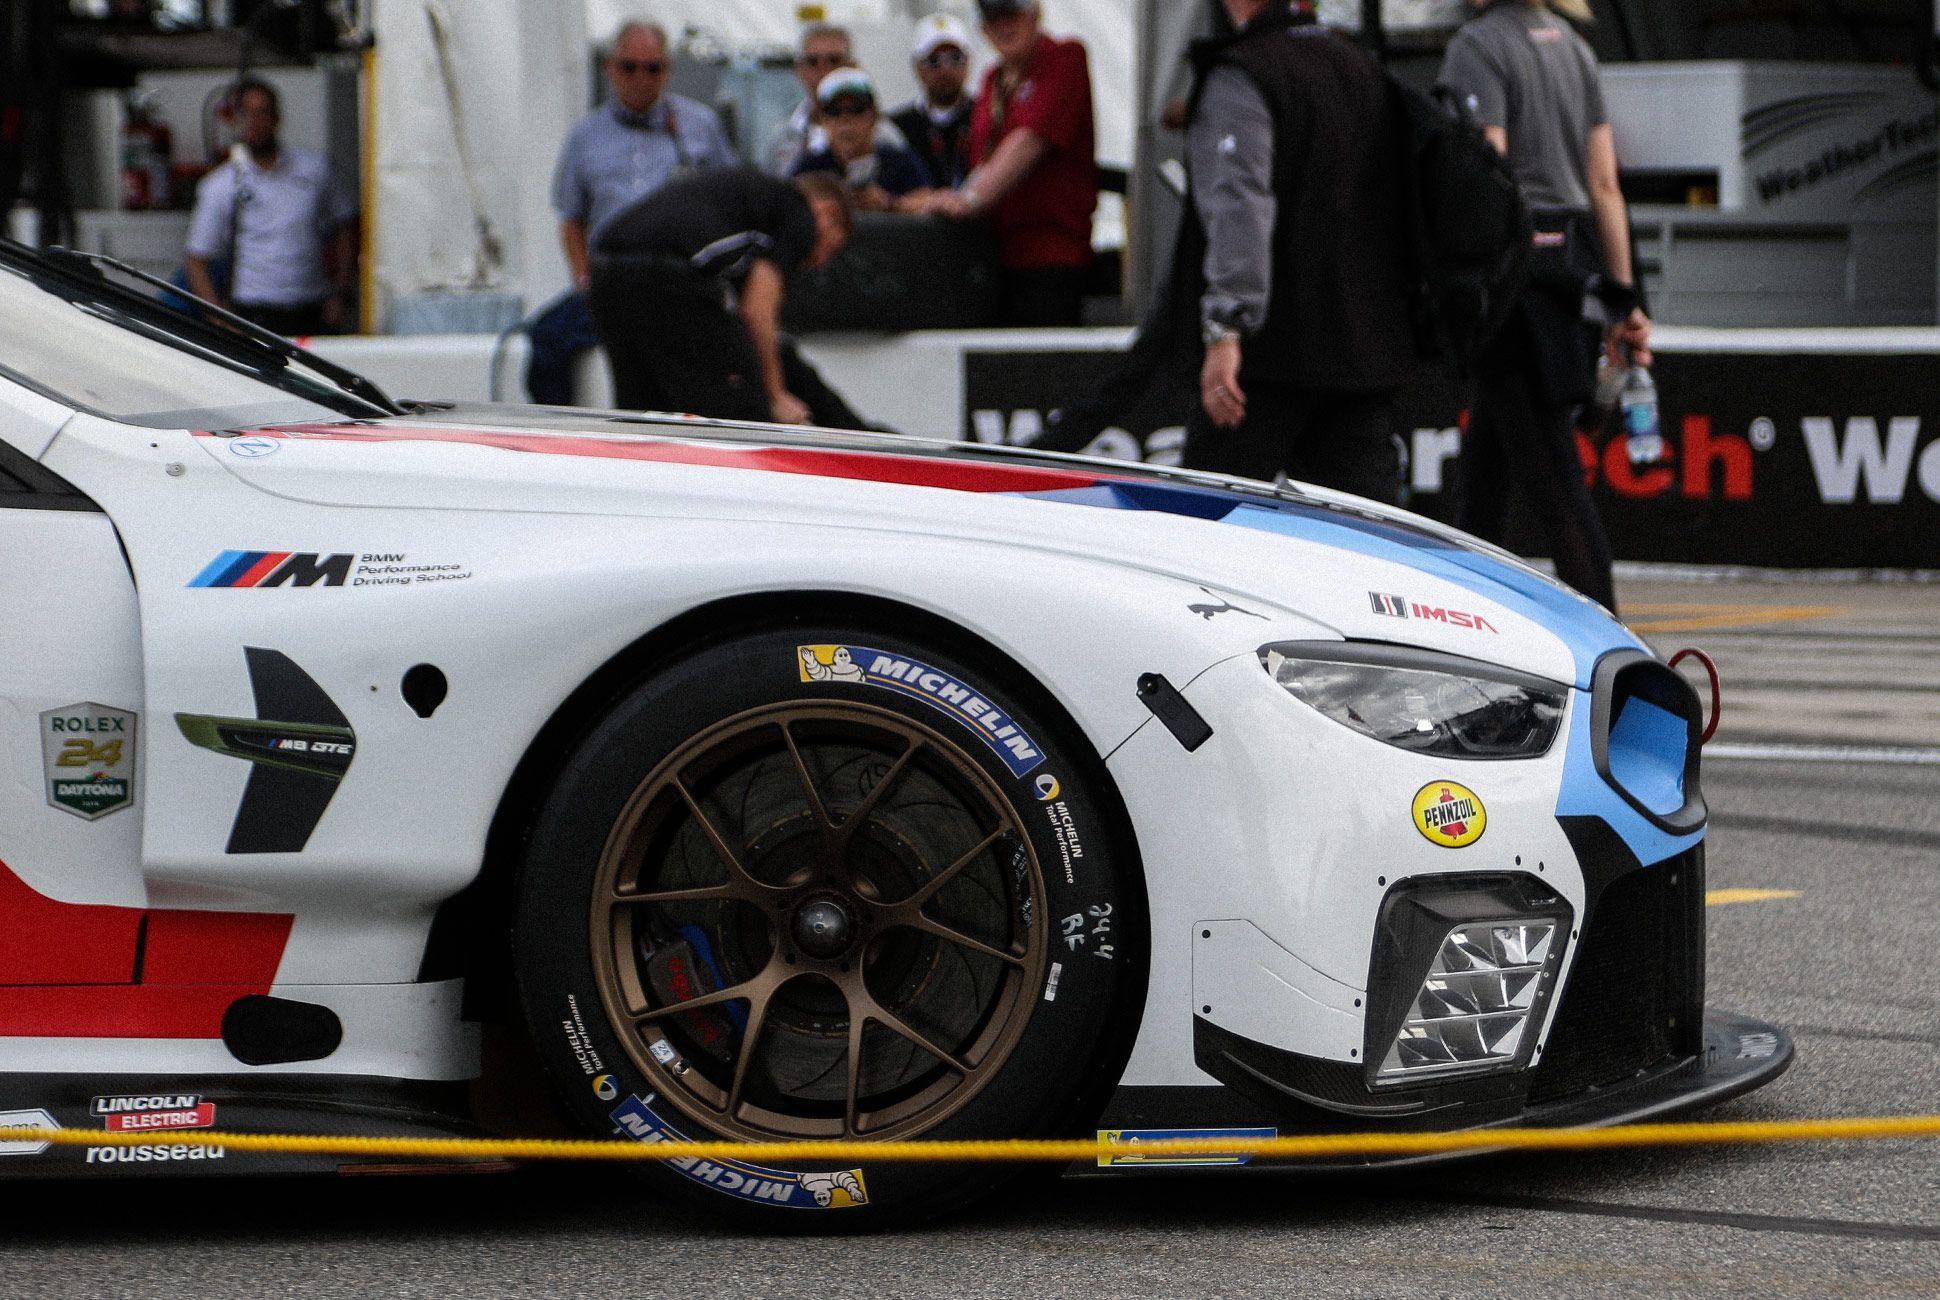 Best-Sports-Cars-of-2018-Daytona-24-Hours-gear-patrol-BMW-M8-GTE-2